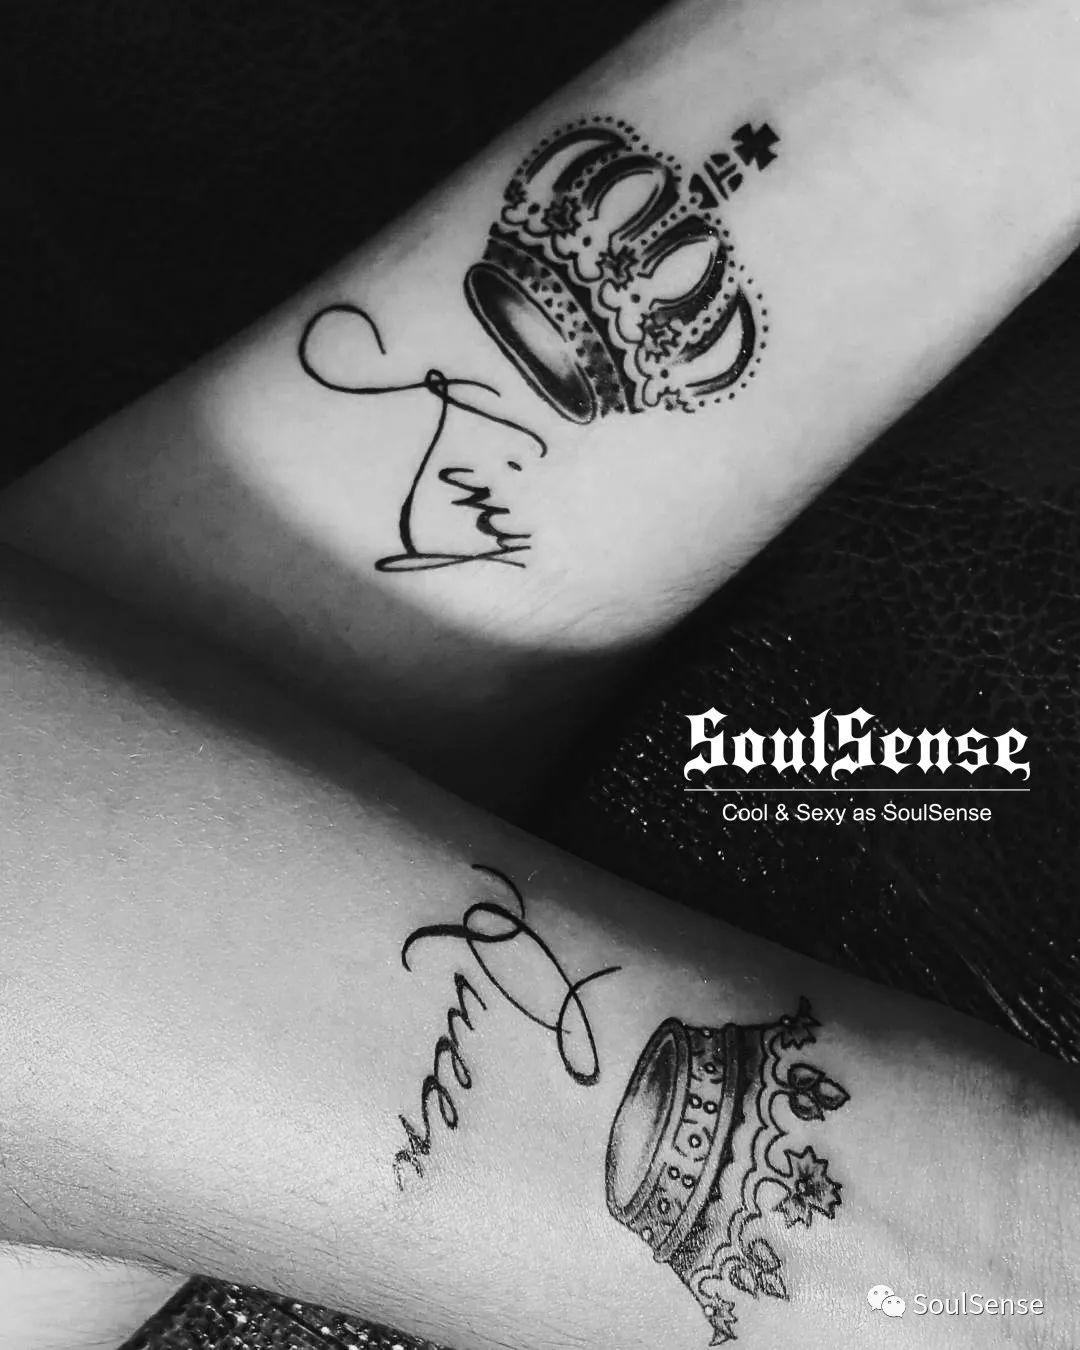 soulsense 纹身 | 皇冠纹身,王的象征